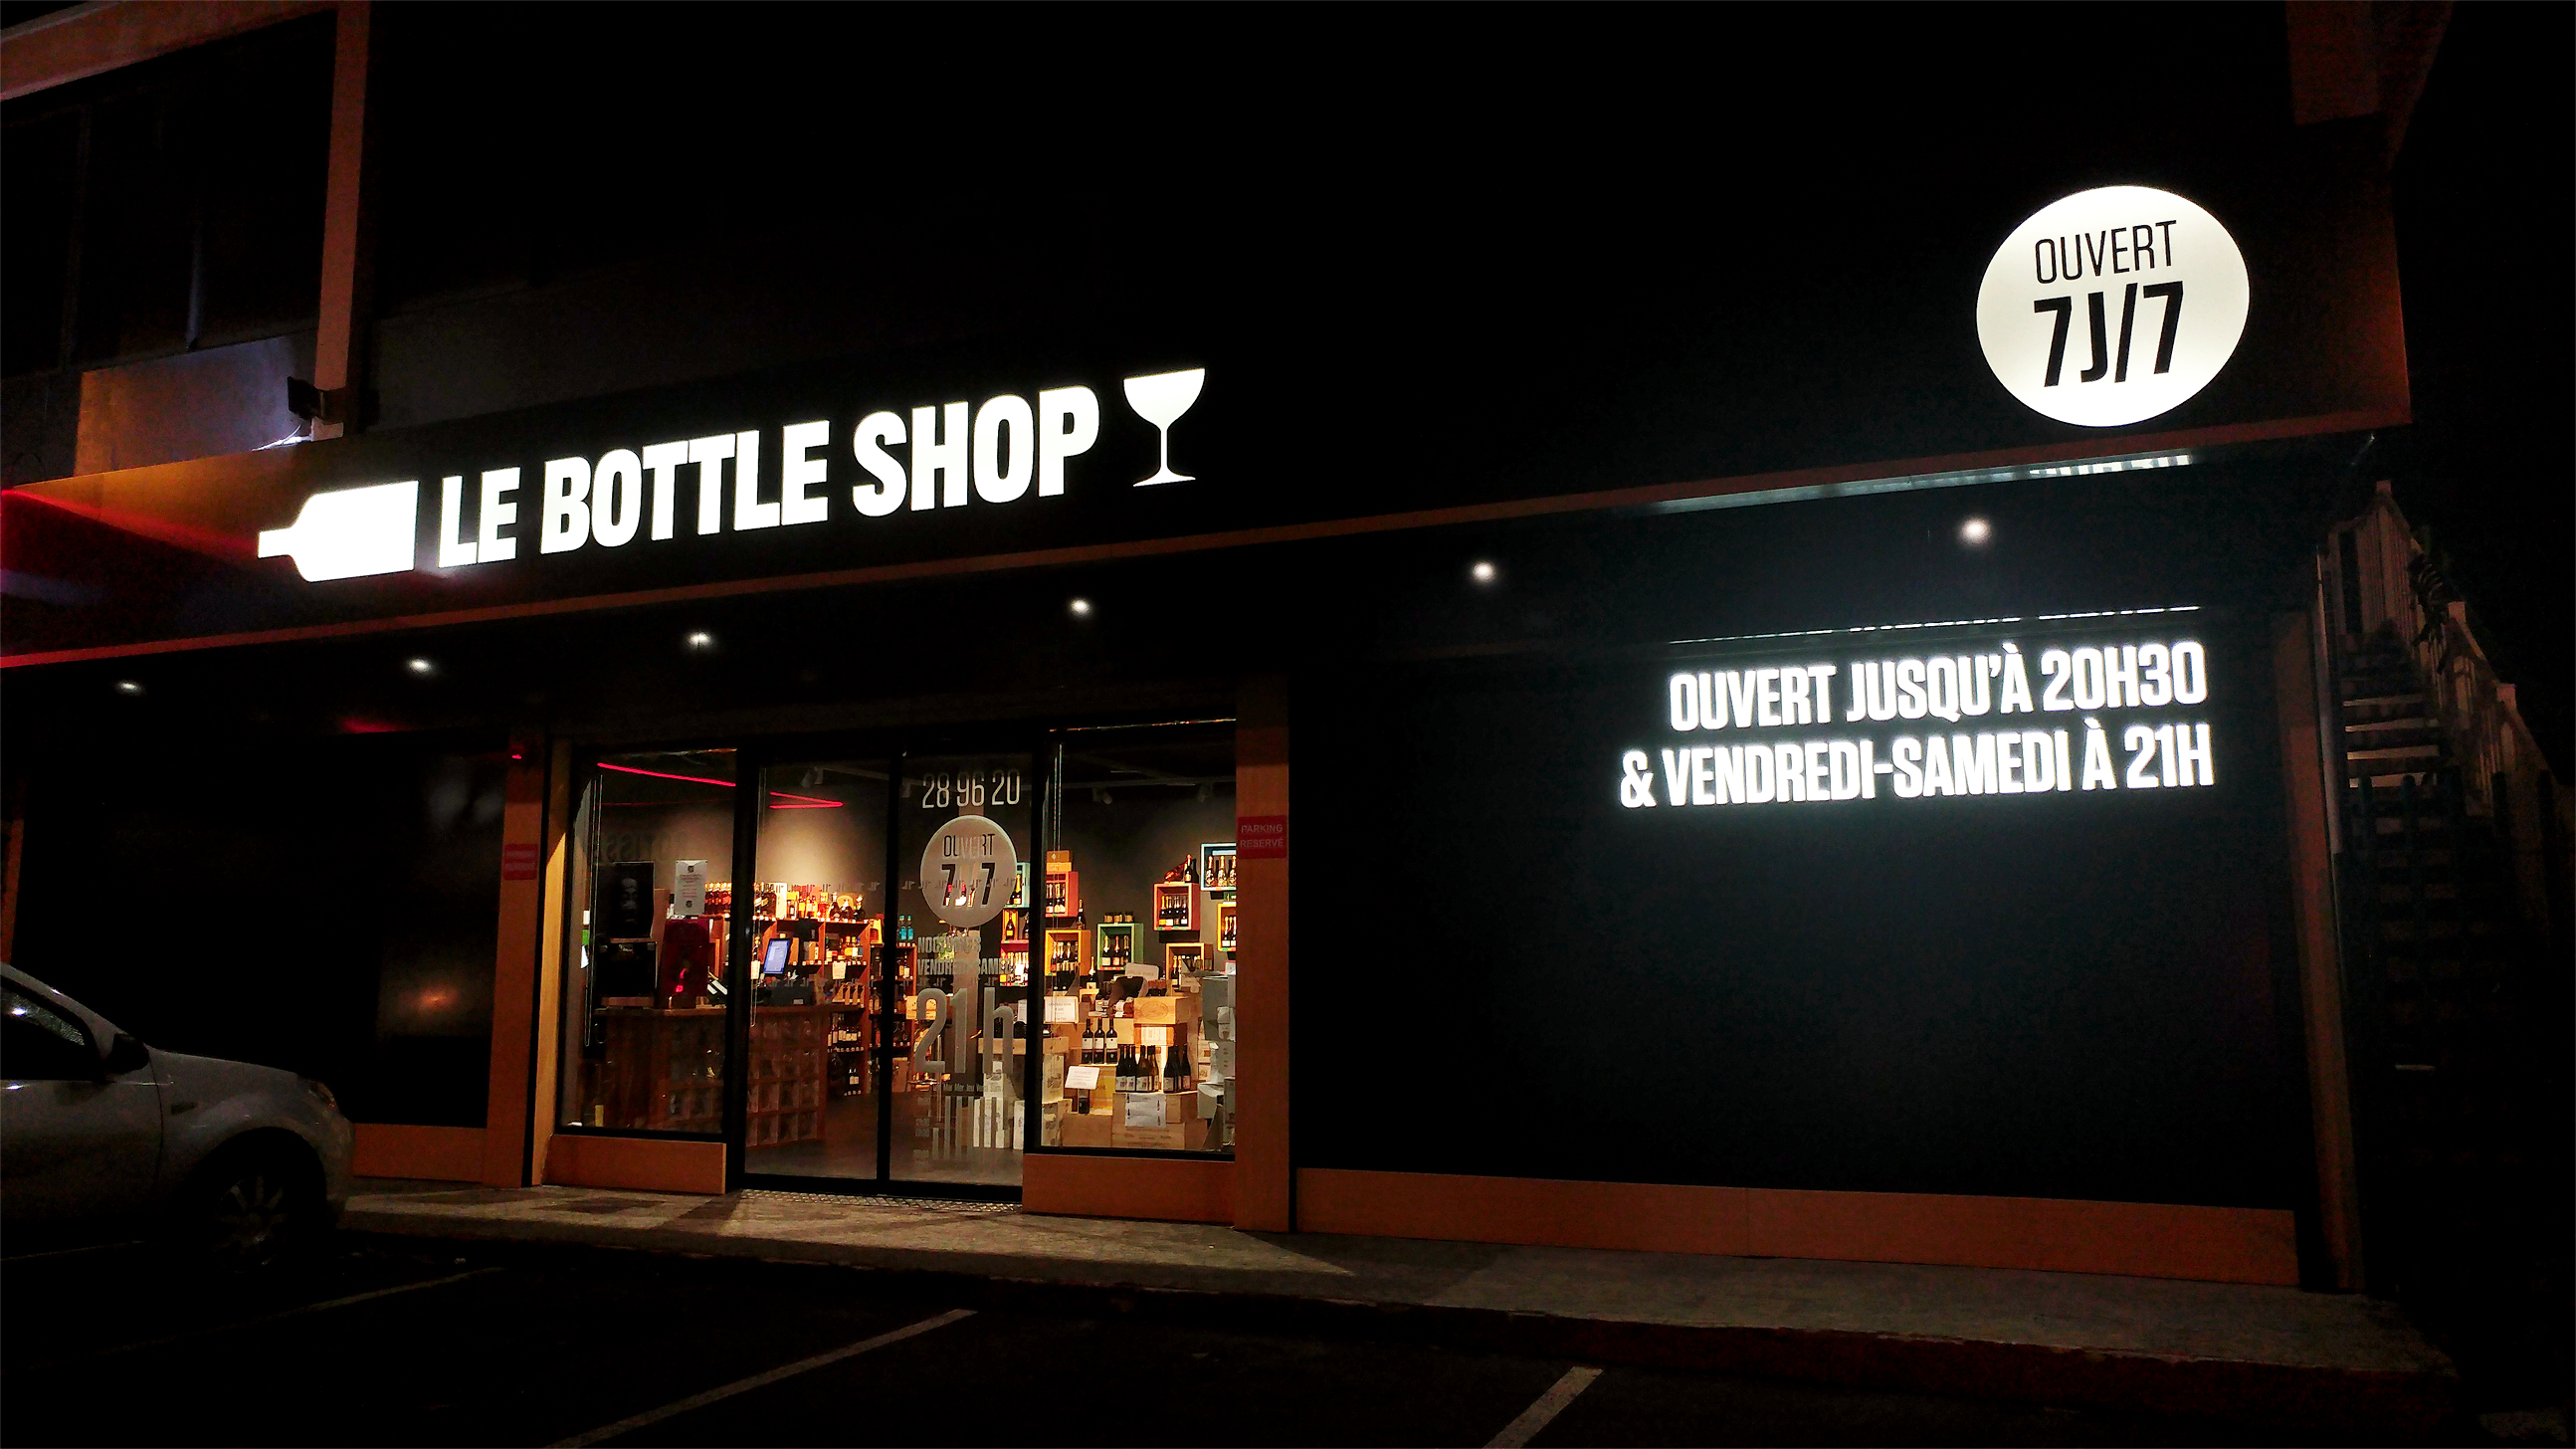 Bottle-Shop-Vinotheque-Identite-Visuelle-Devanture